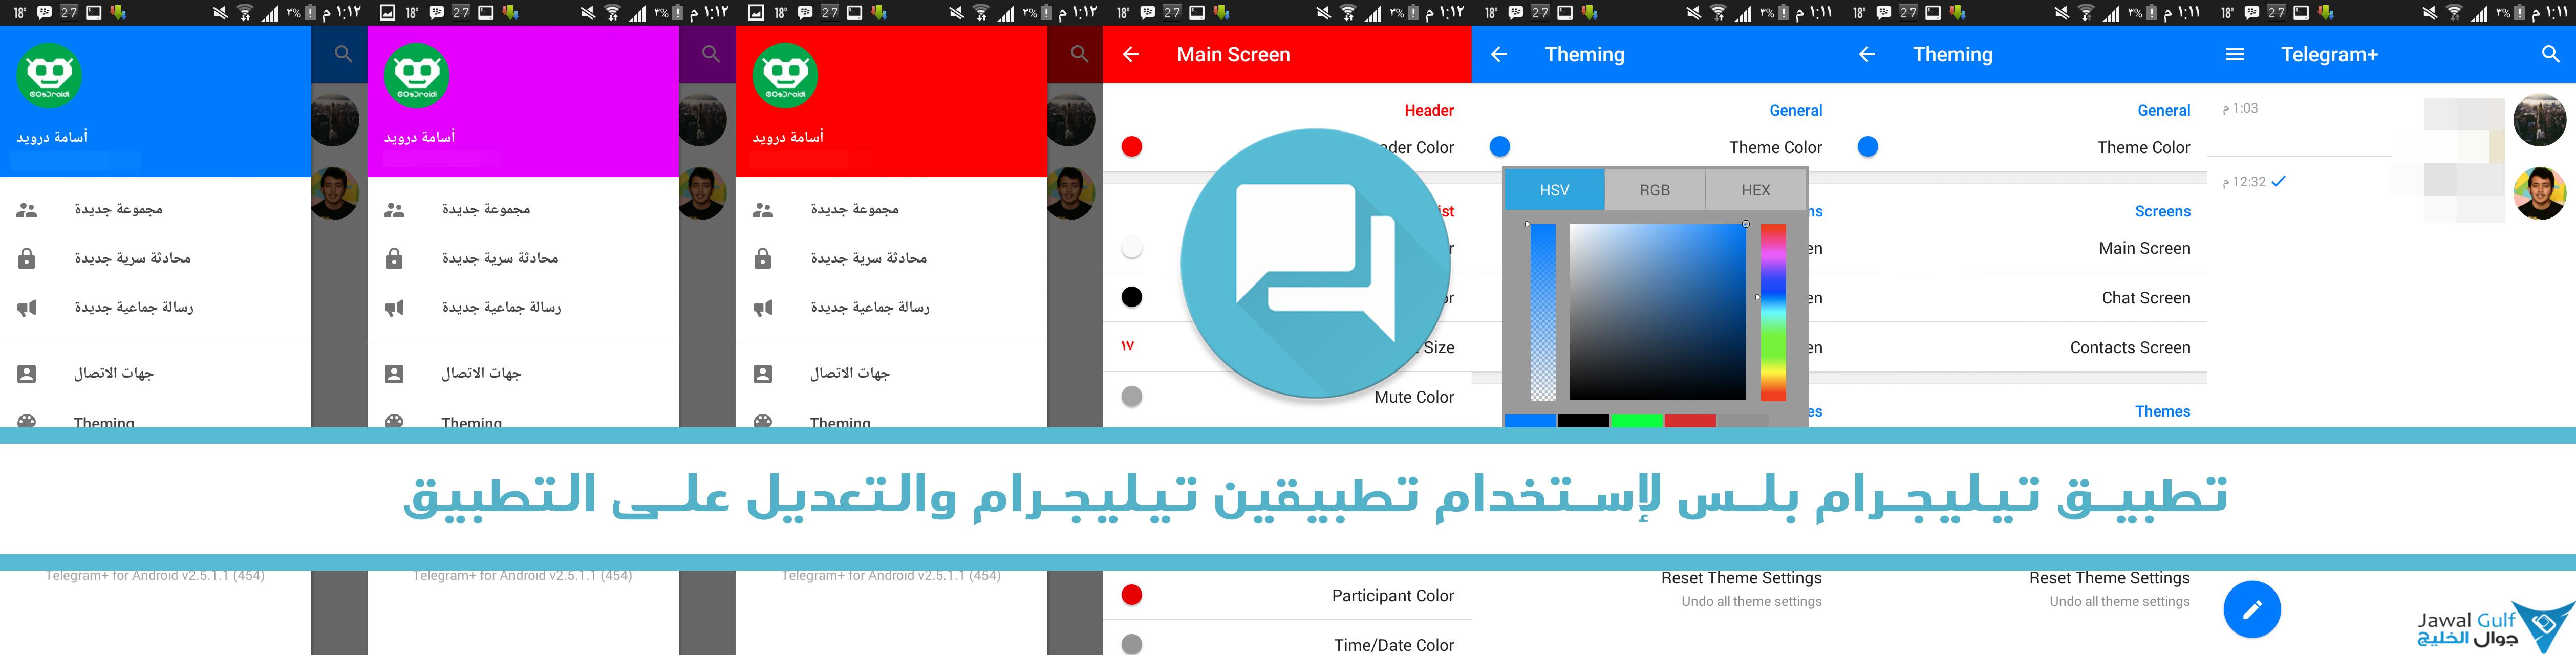 Screenshot_٢٠١٥-٠٢-٢٧-١٣-١٢-٠٧